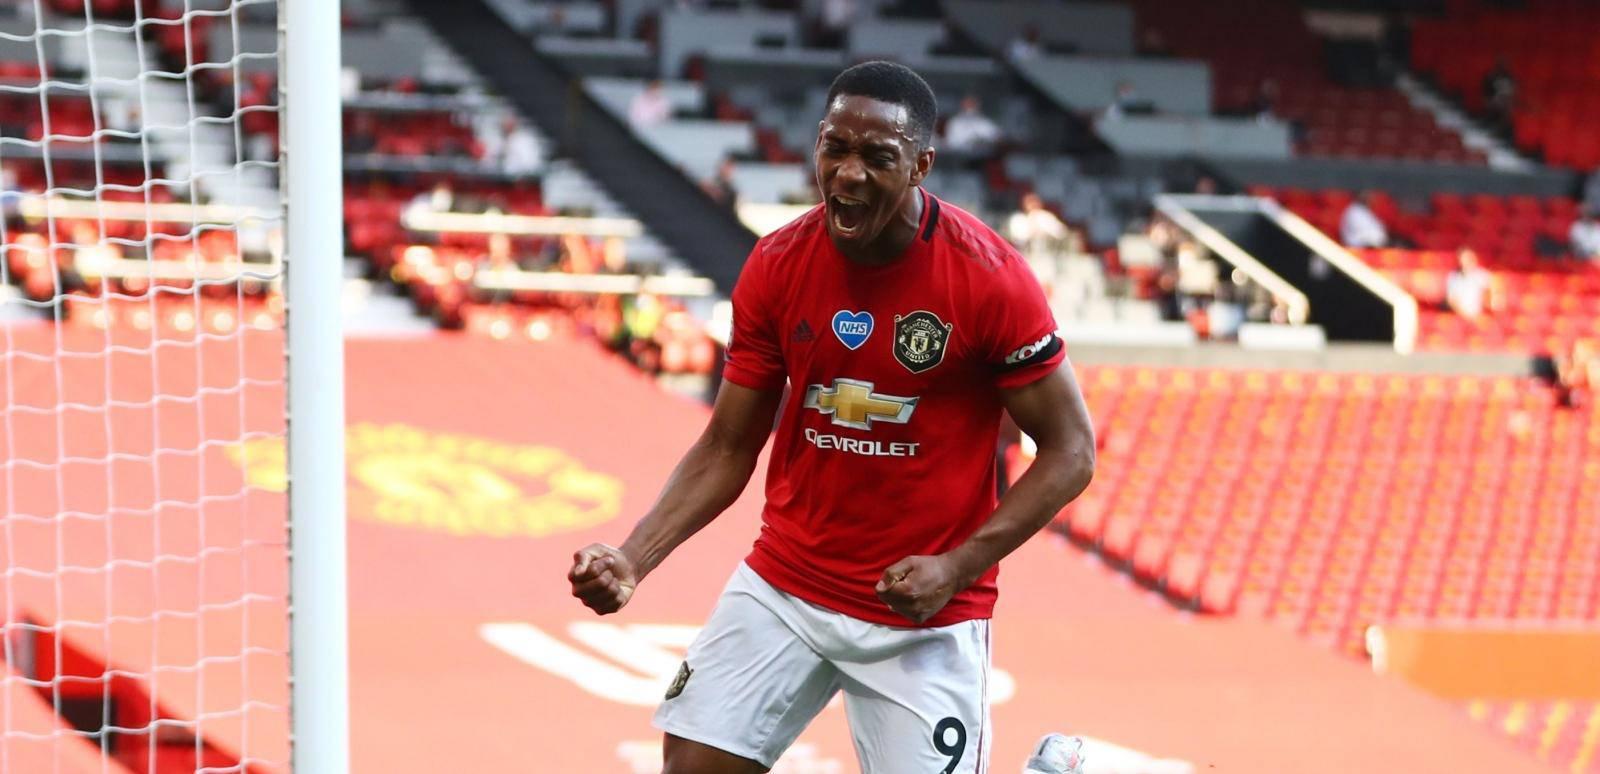 Premier League - Manchester United v Sheffield United